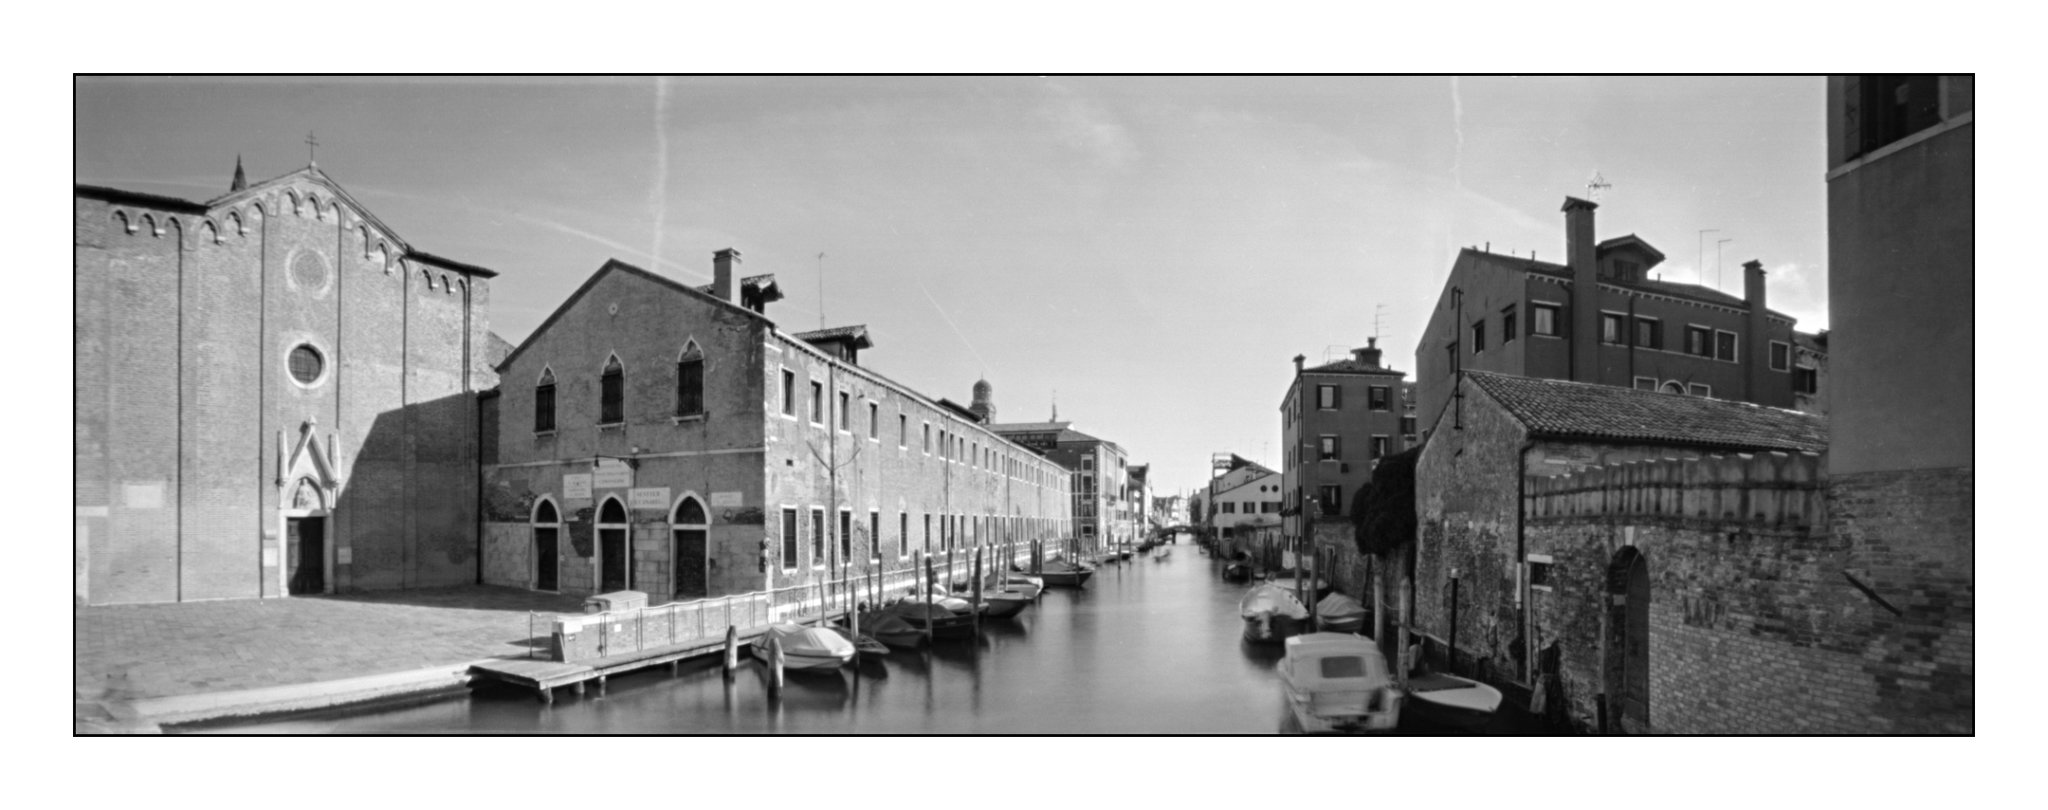 Venedig - Canareggio, Lochkamera 16x7 analog: Venedig, Fotograf: Steffen Lohse